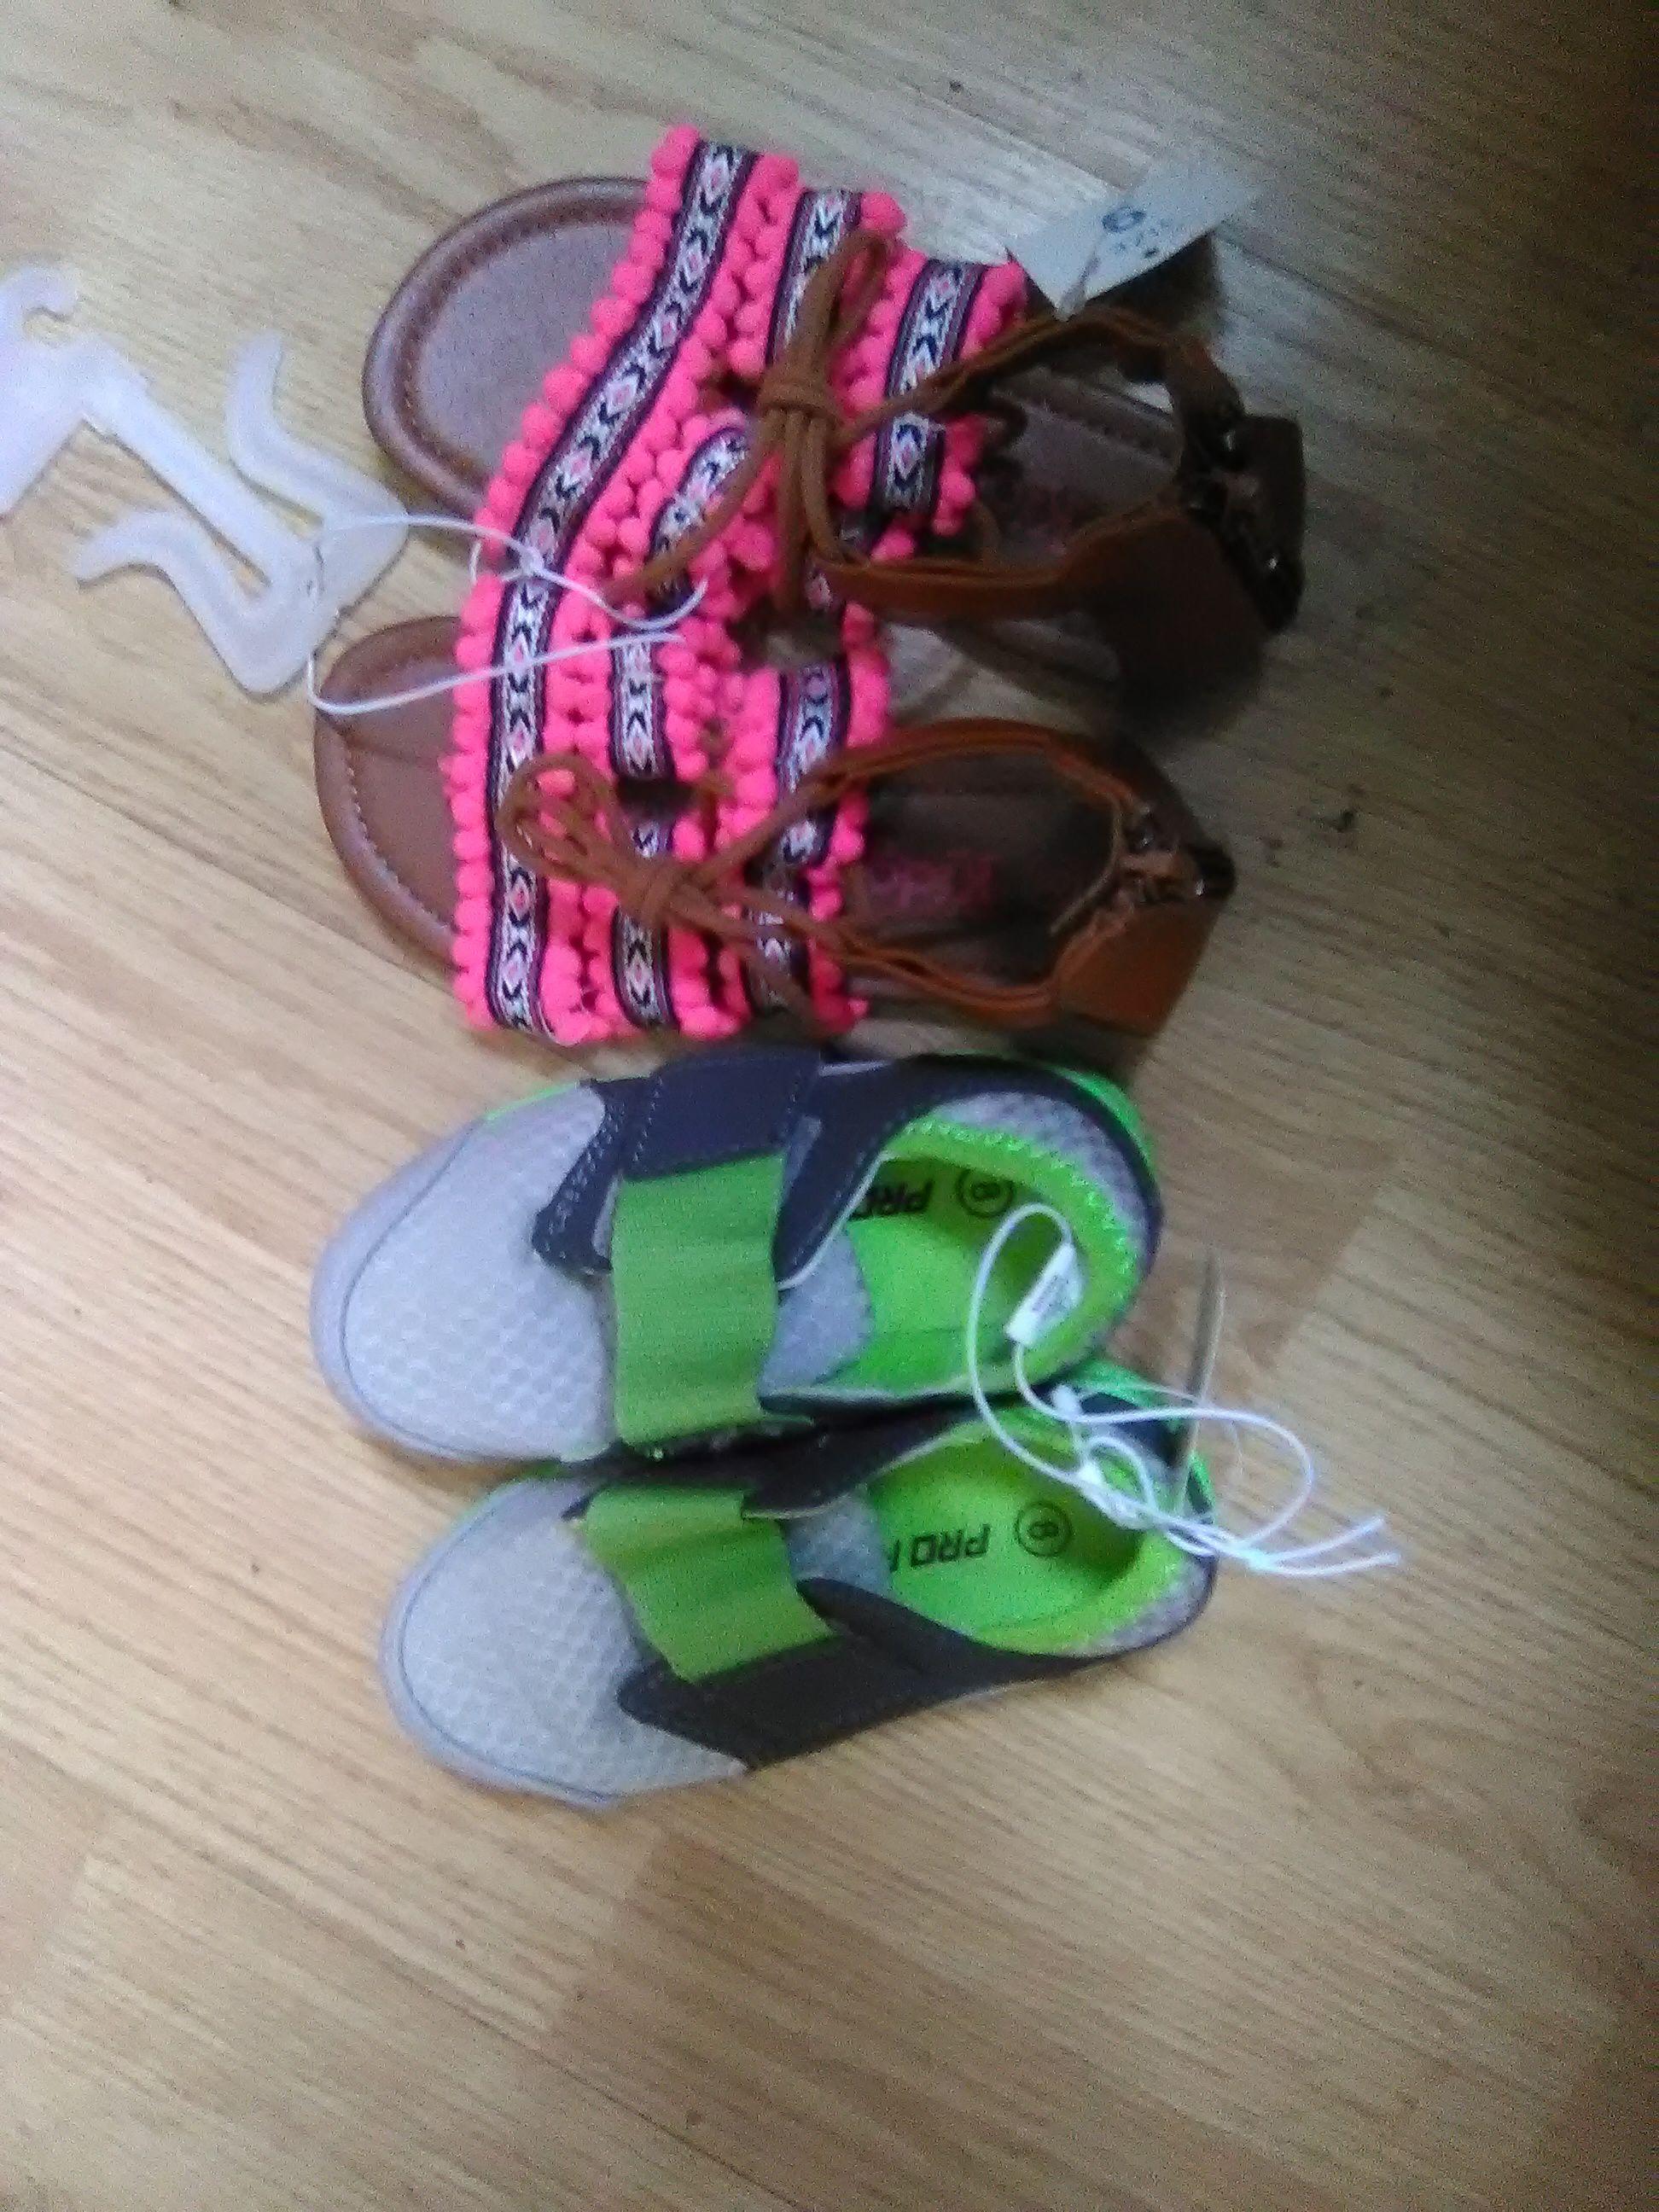 2 Brand new paír never worn